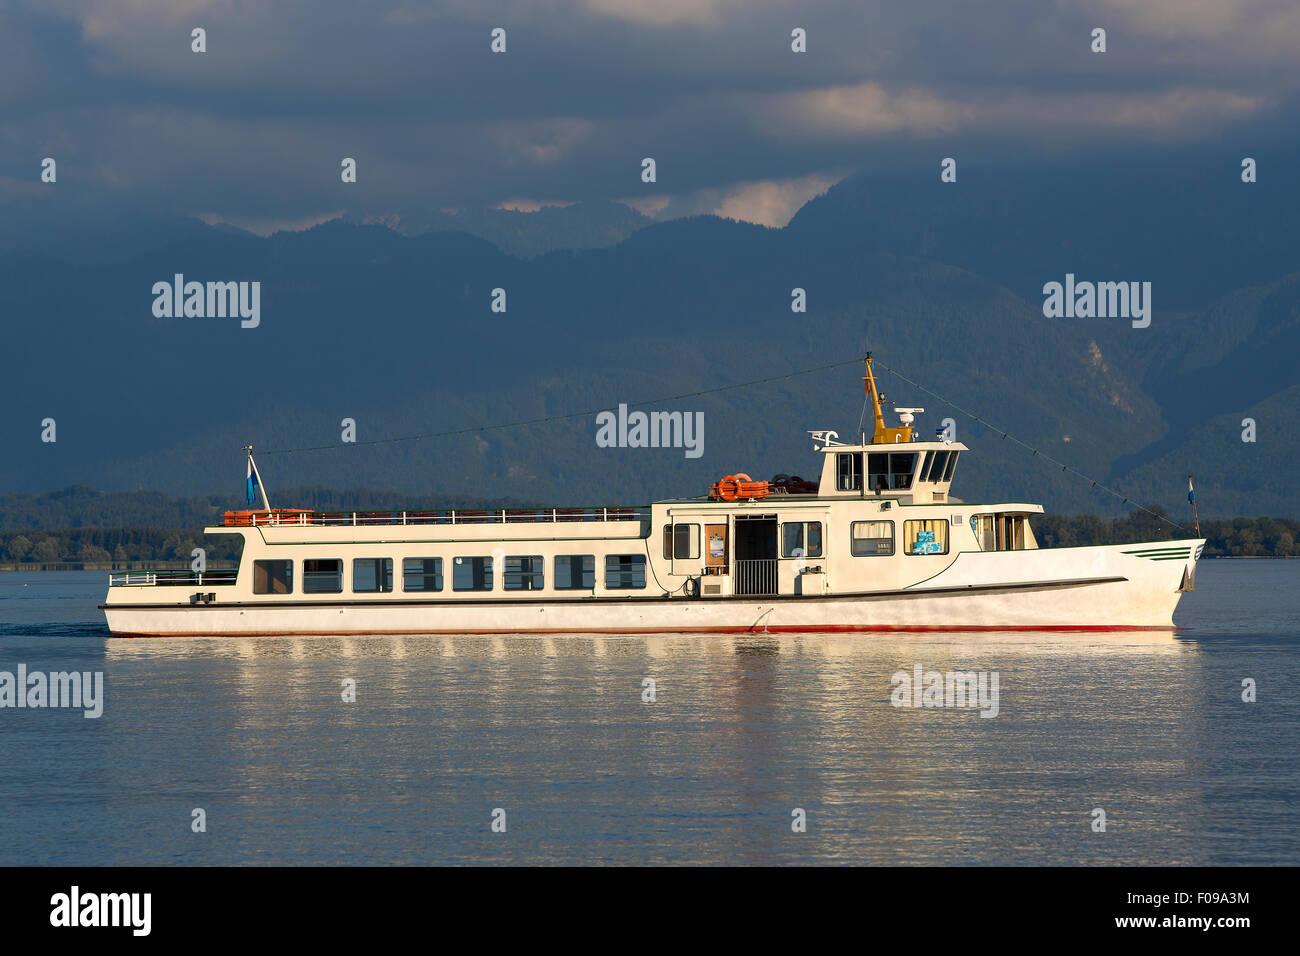 Steamship at lake Chiemsee in Bavaria, South Germany Stock Photo